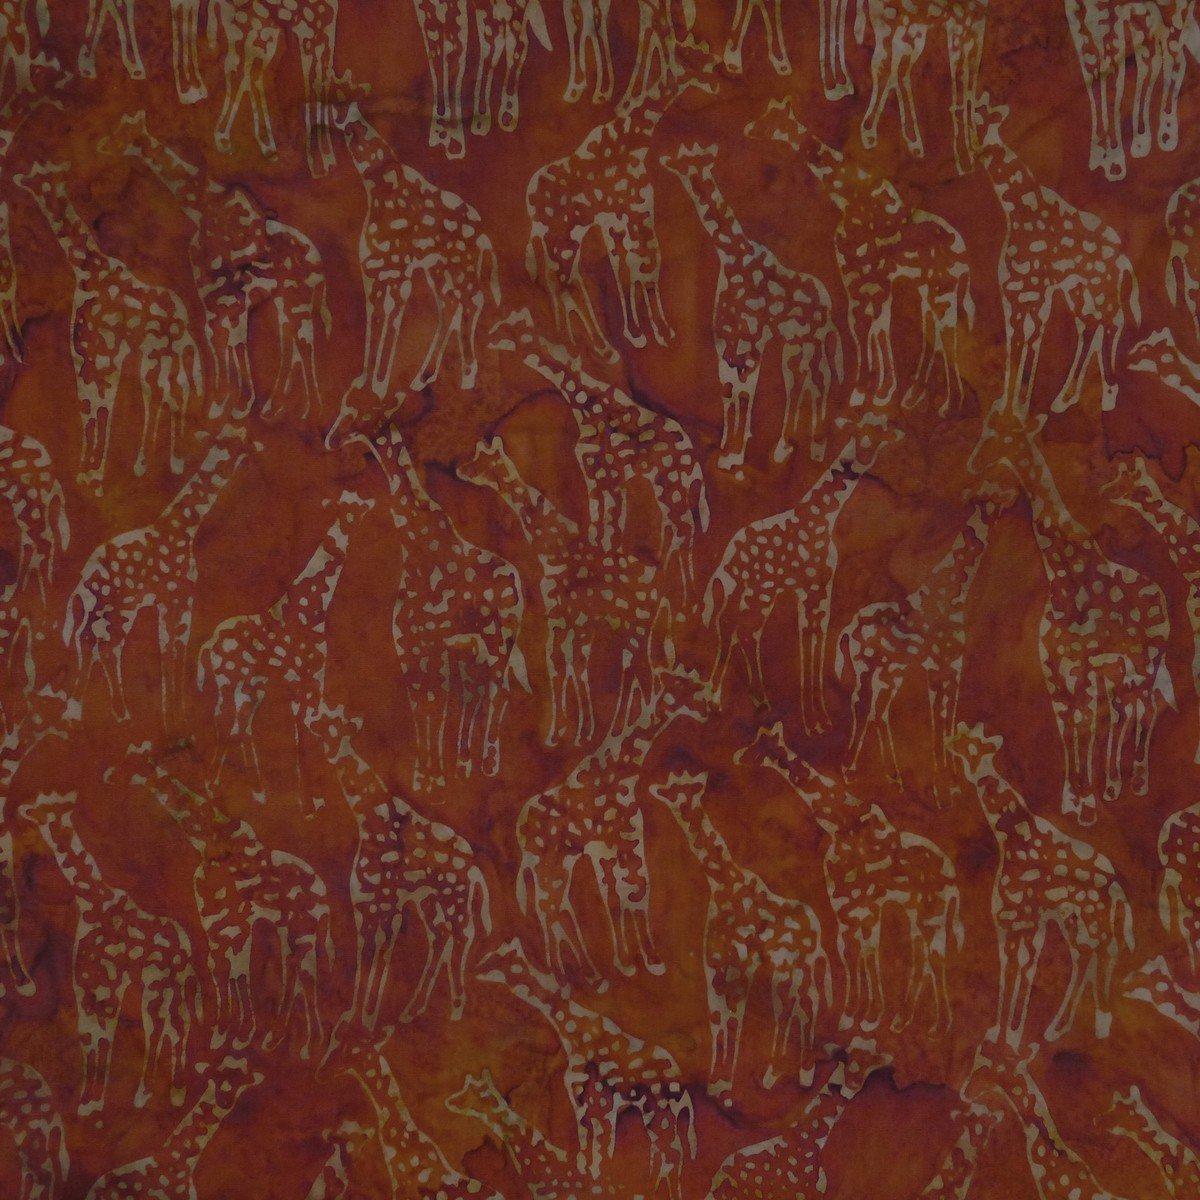 Batik by Mirah CI-3-9718 Bright Clay